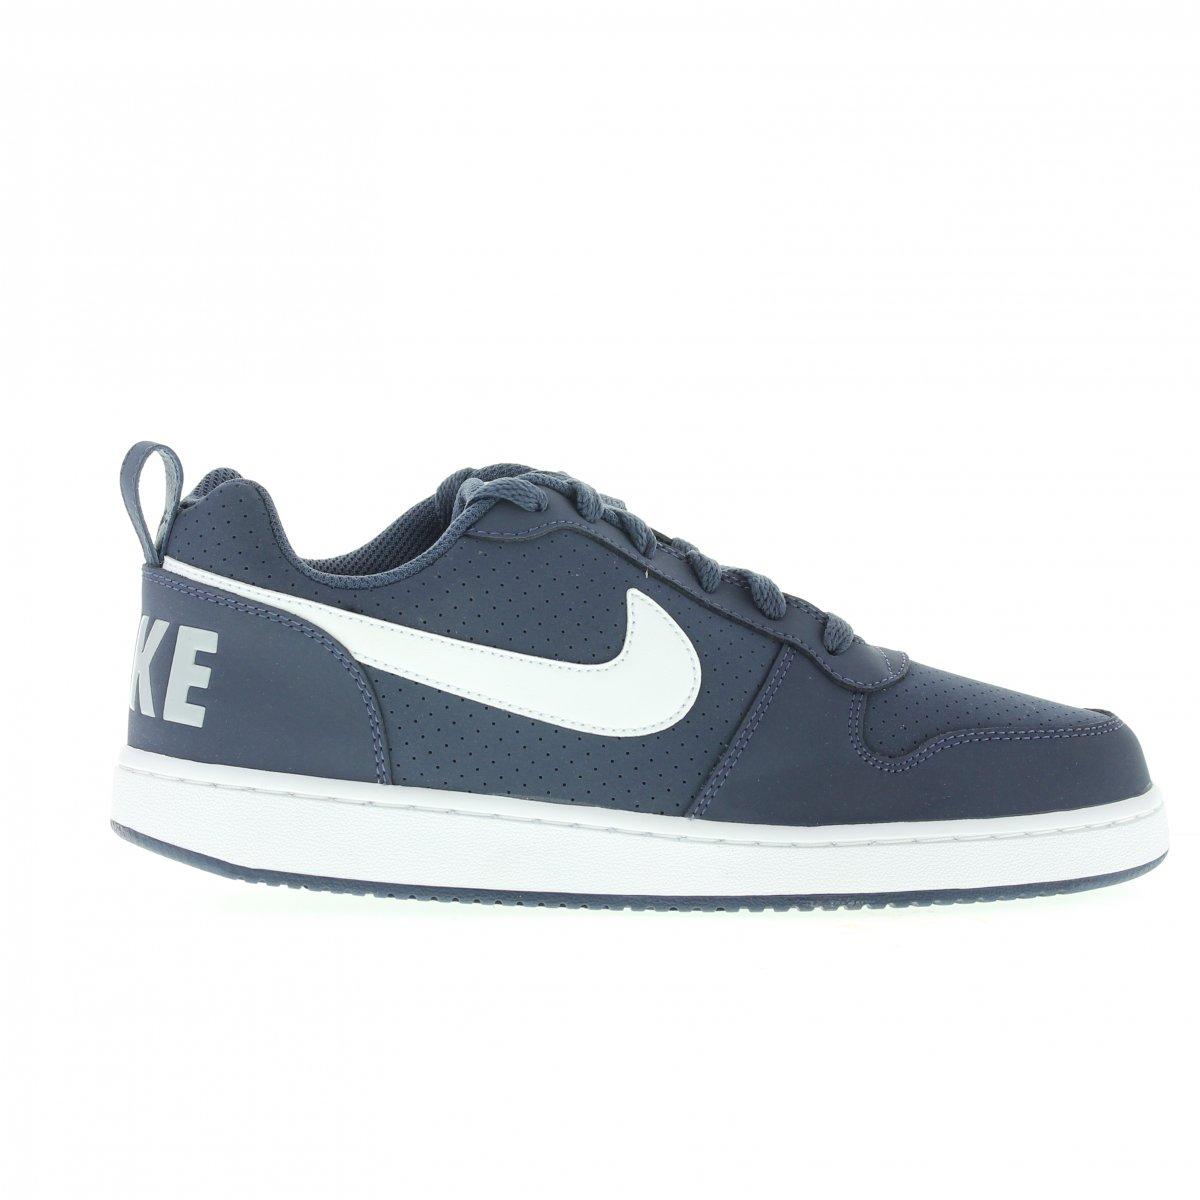 4c44b837e30 Tenis Nike Court Borough Low